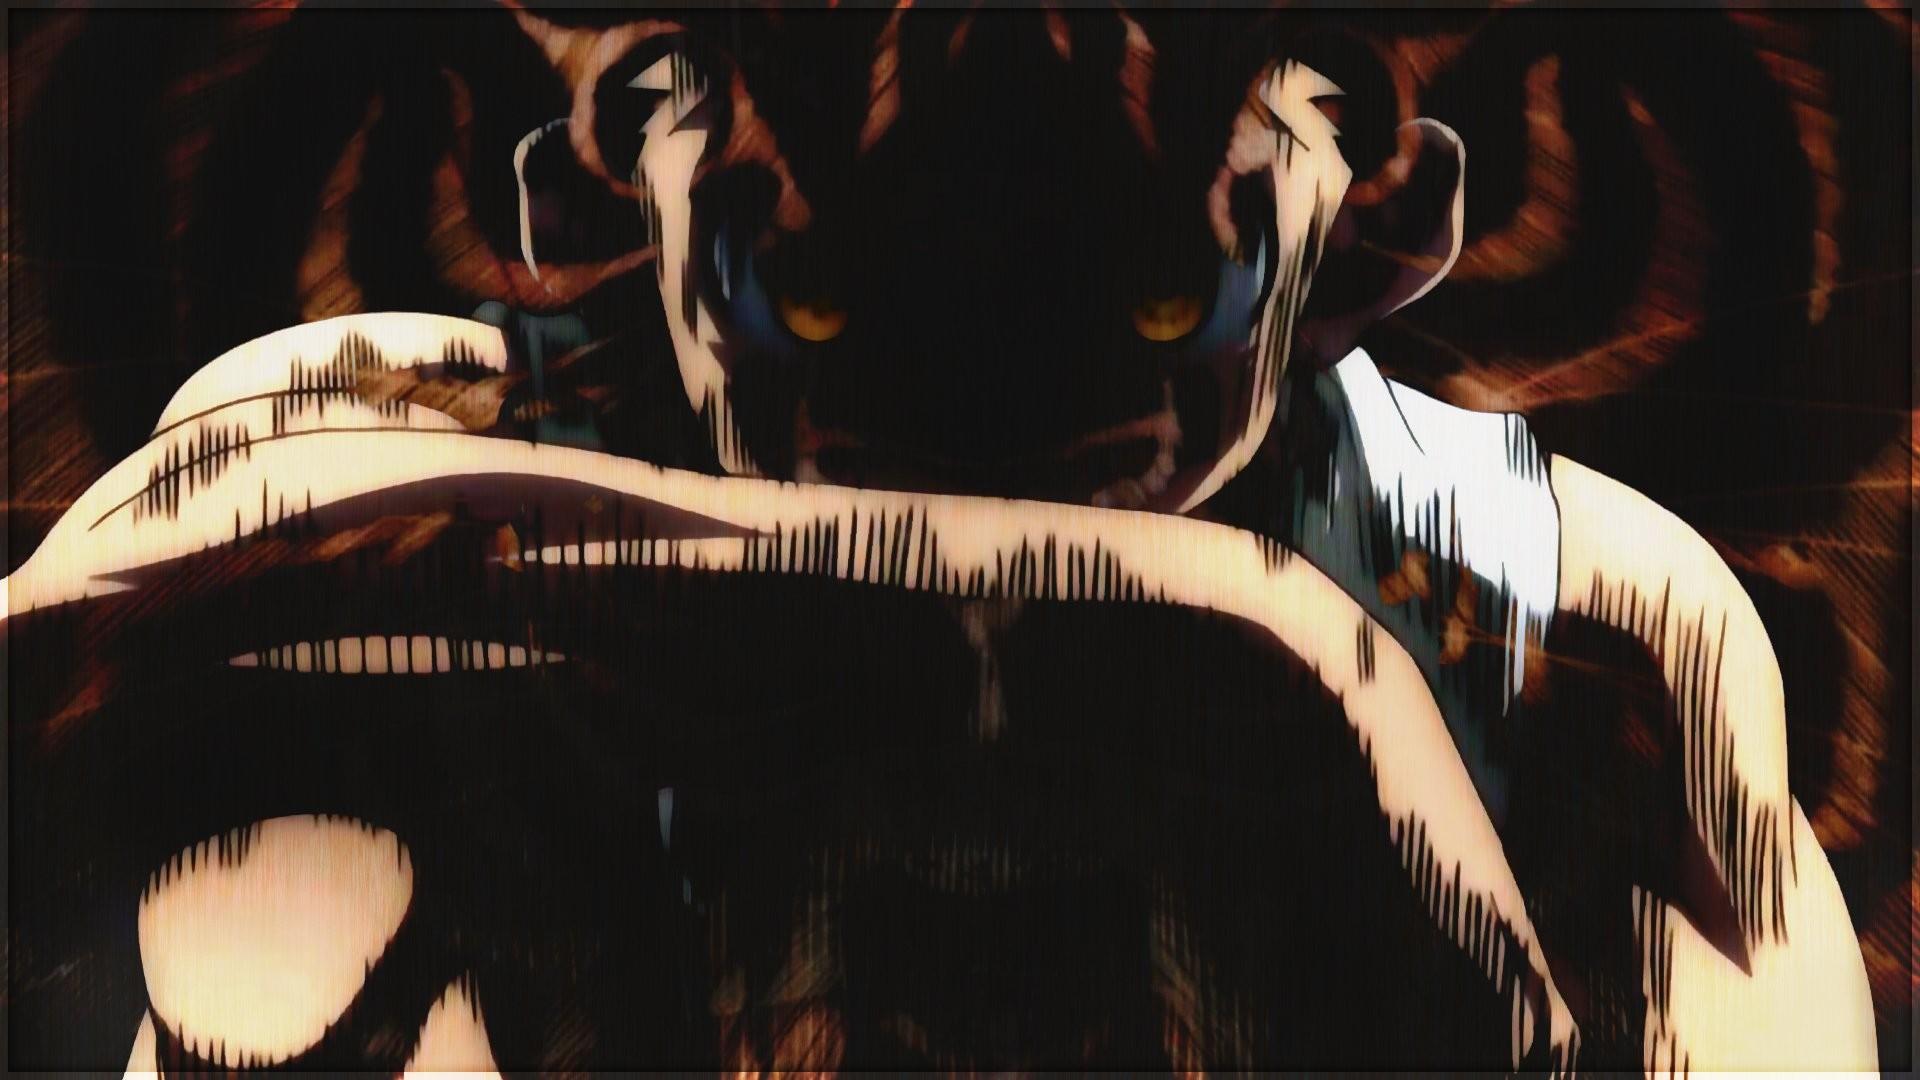 Fond d'écran HD | Arrière-plan ID:748854. Anime Hunter x Hunter